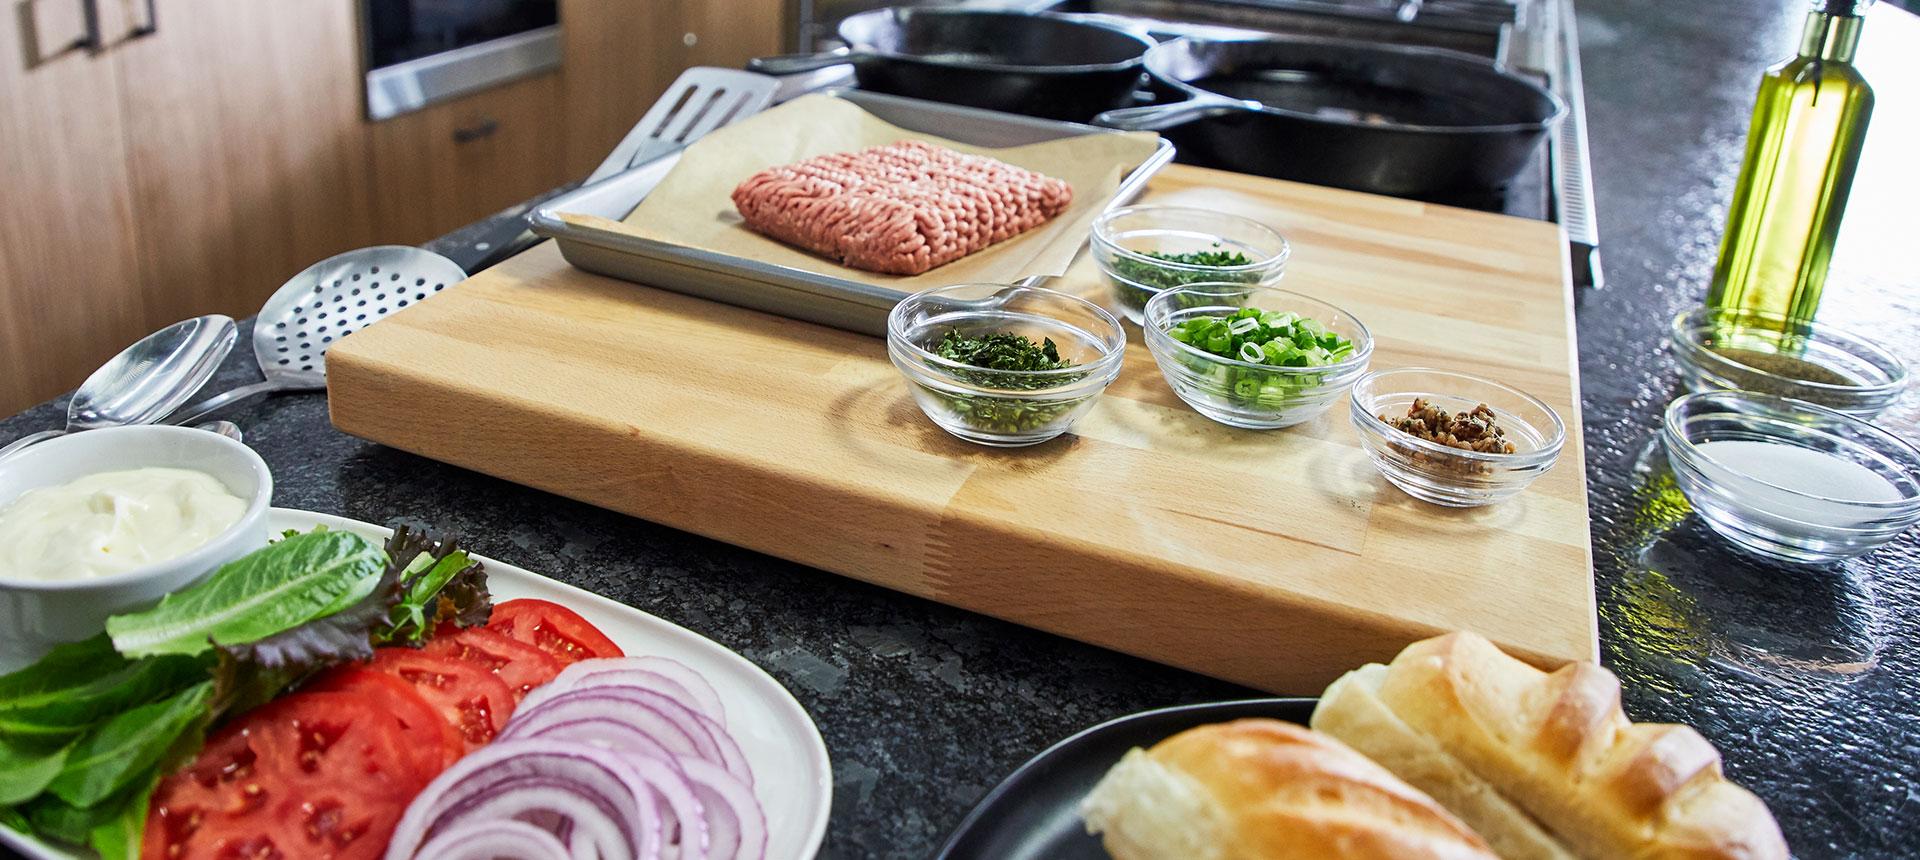 Food-Slideshow-Image-3.jpg